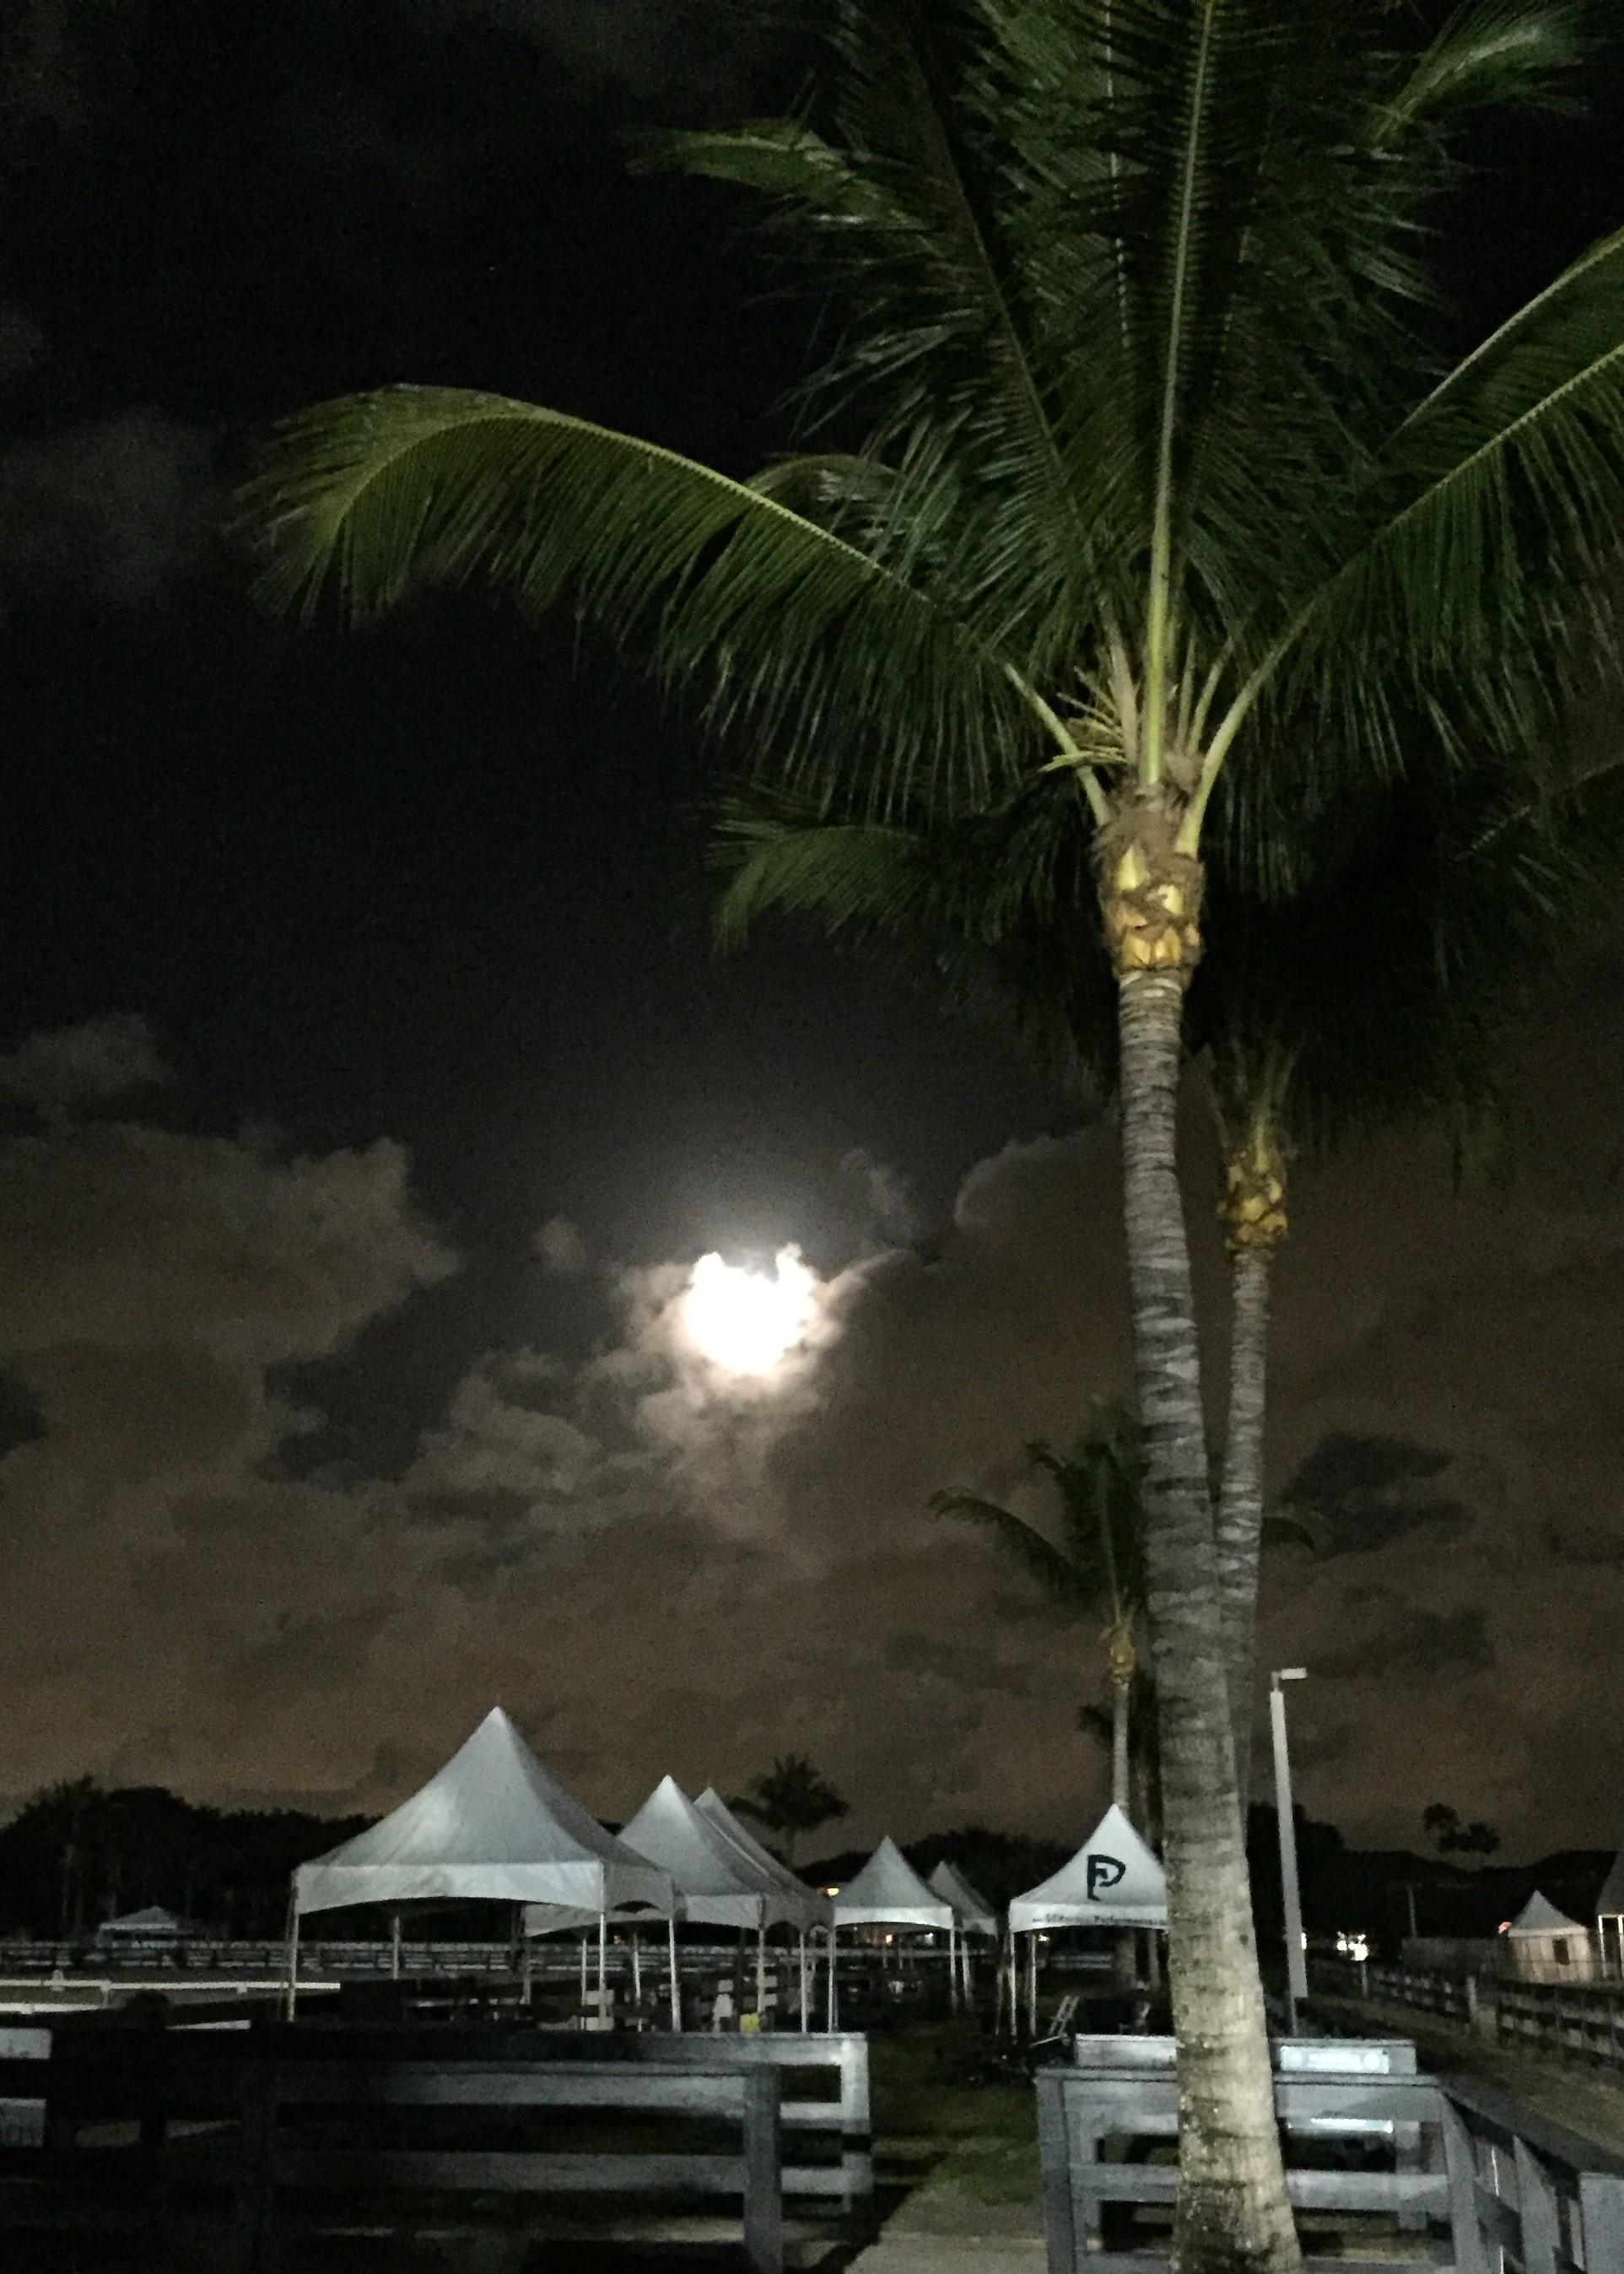 Moonrise at the Global Dressage Festival